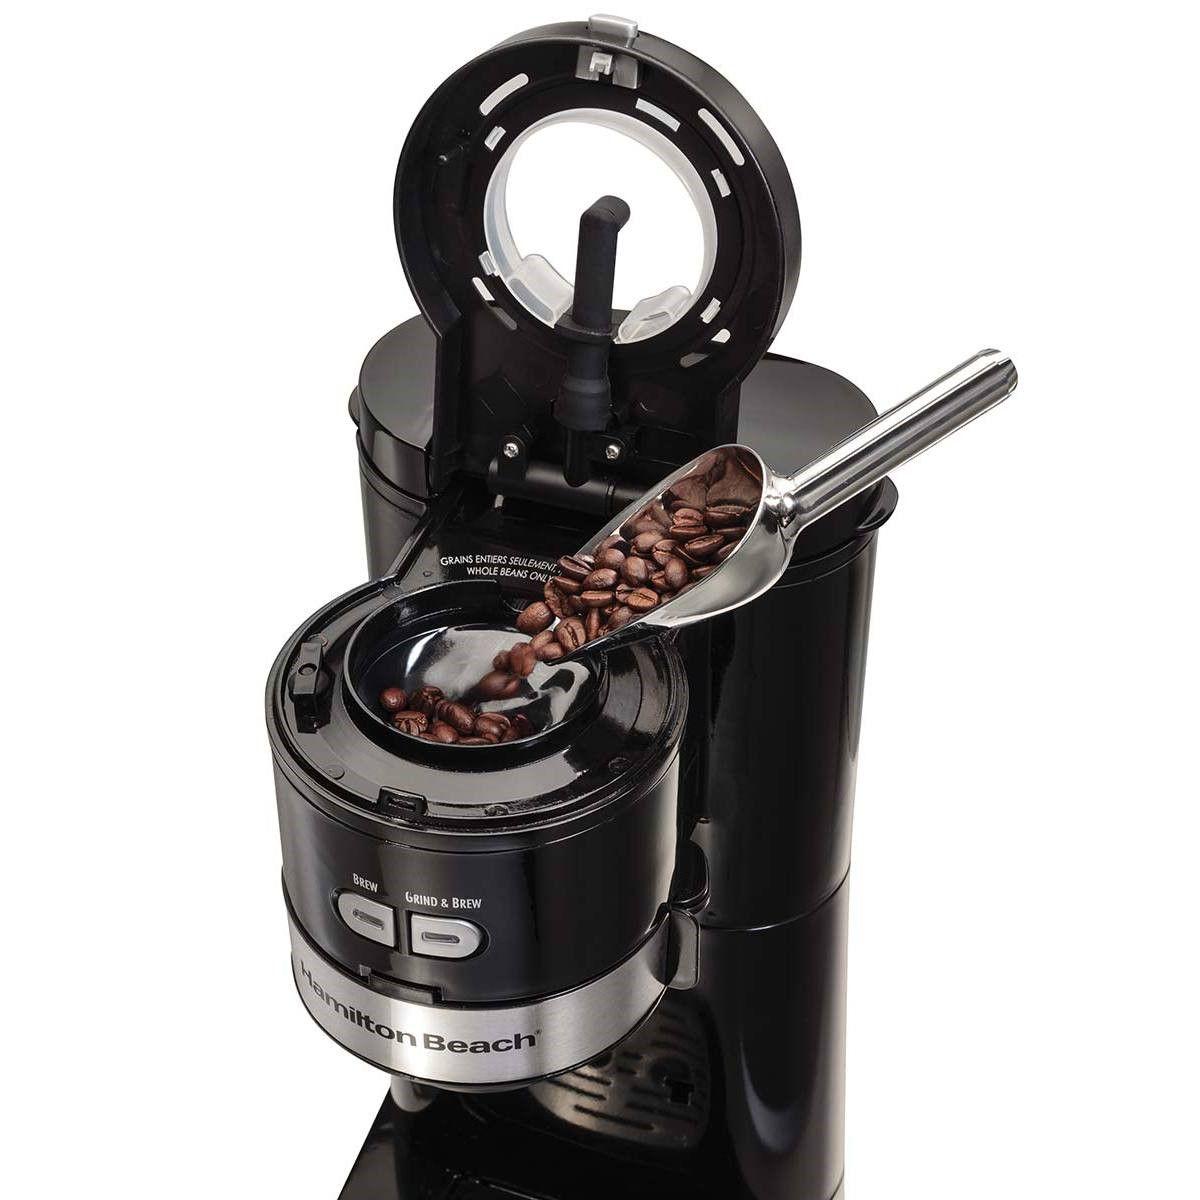 Cuisinart Single Cup Grind & Brew Coffee Maker w/ Water